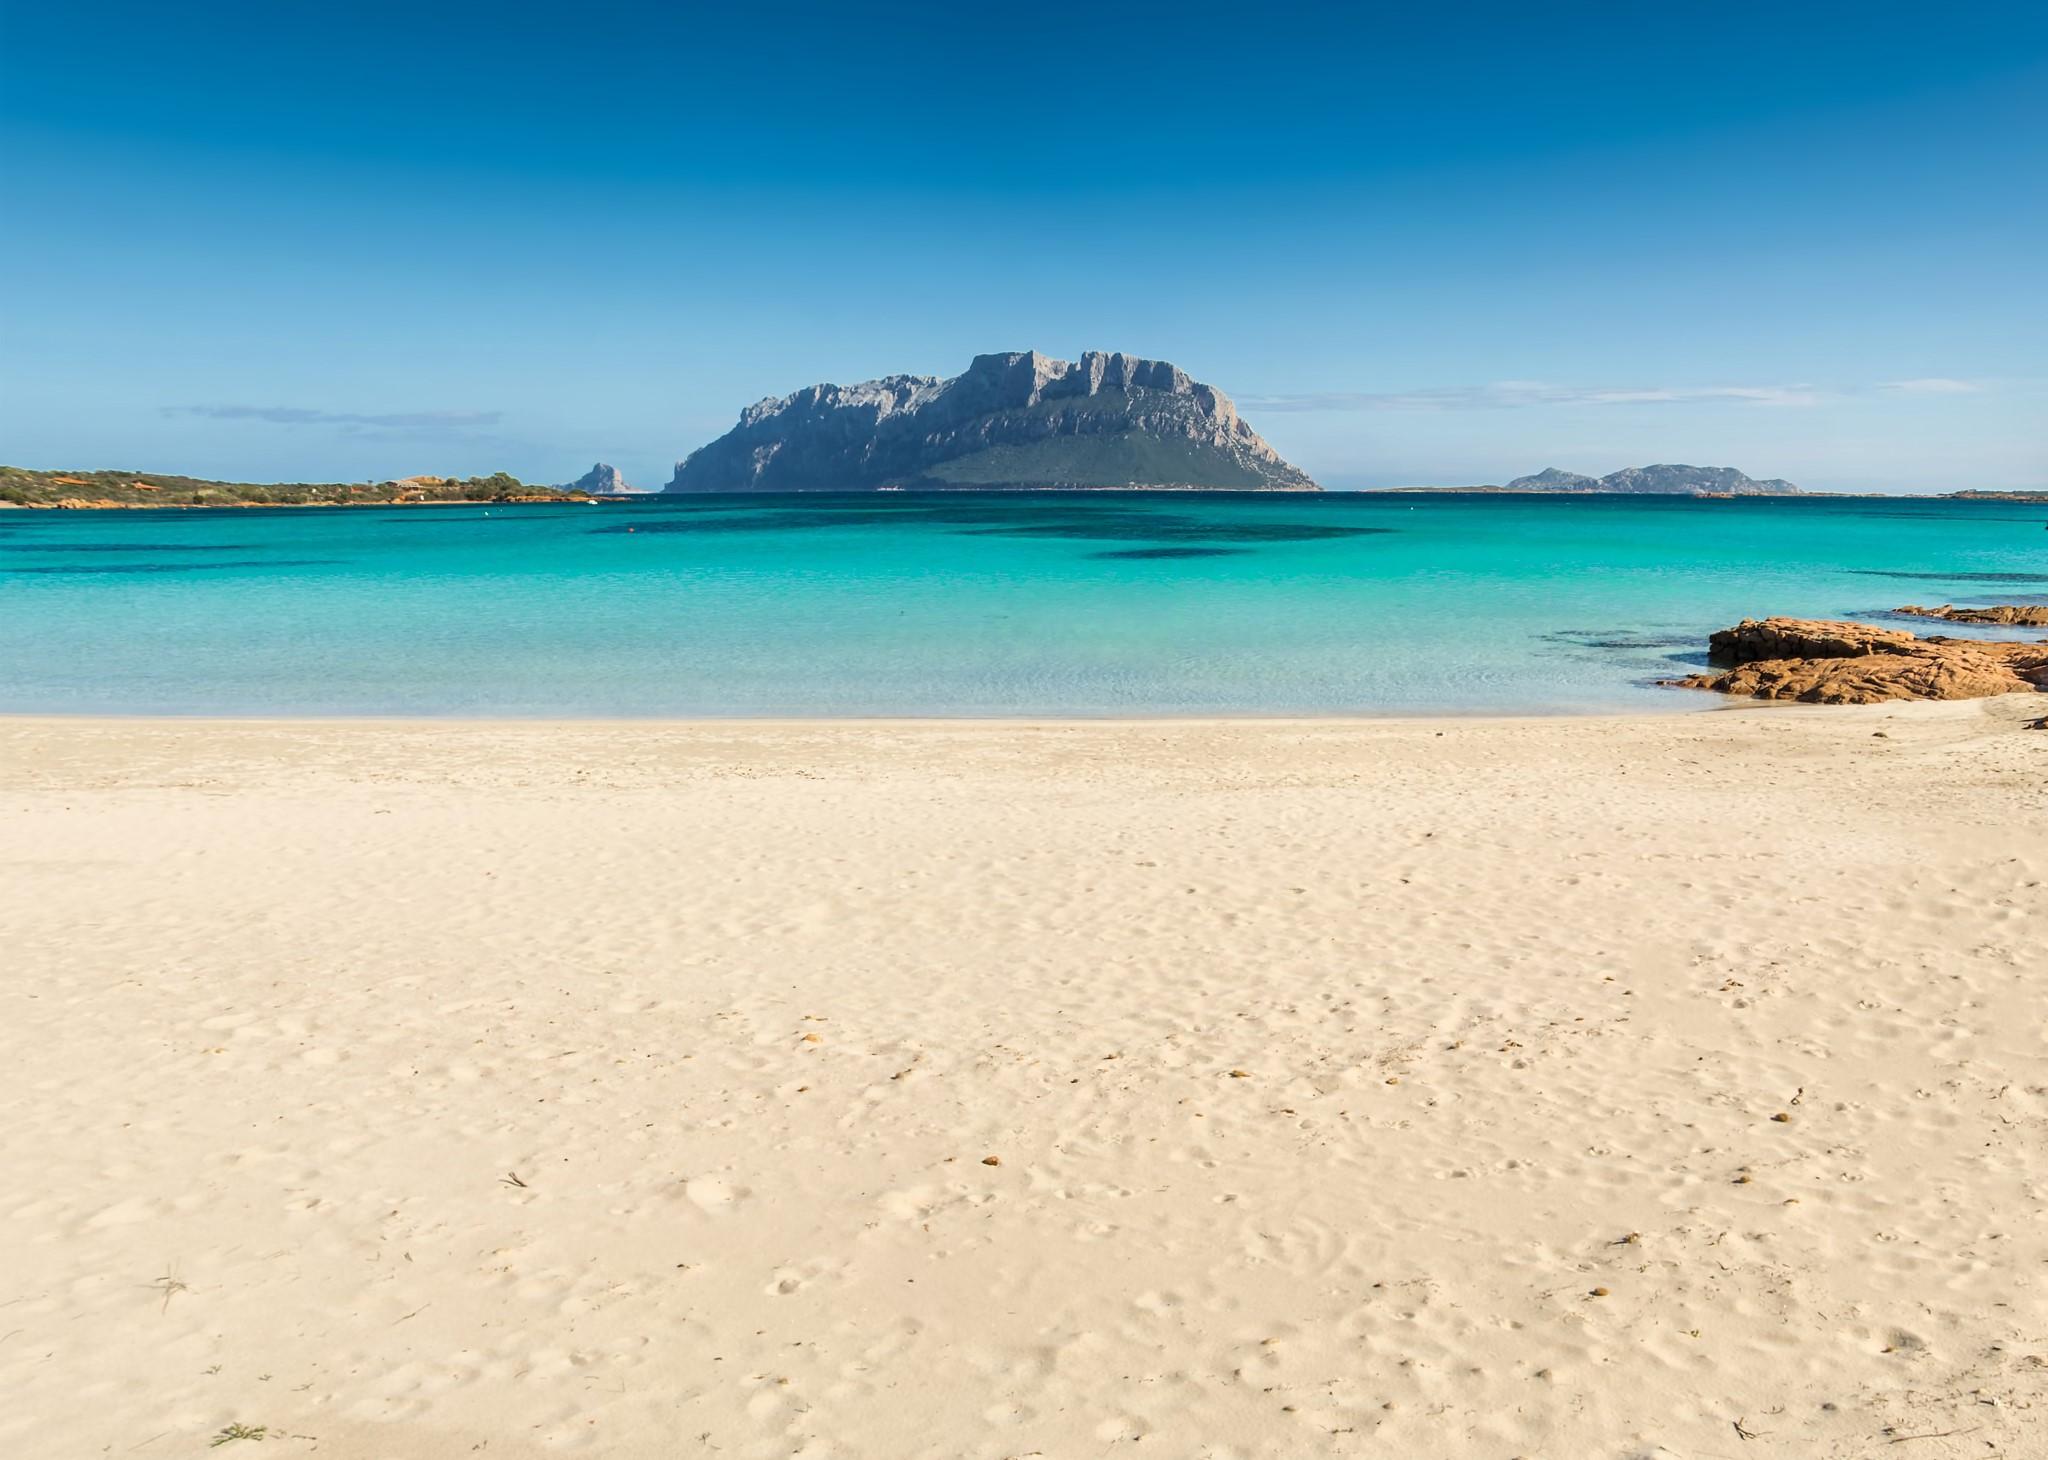 Crystalline sea on the beach of Porto Istana, Olbia, north-east coast of Sardinia, Italy